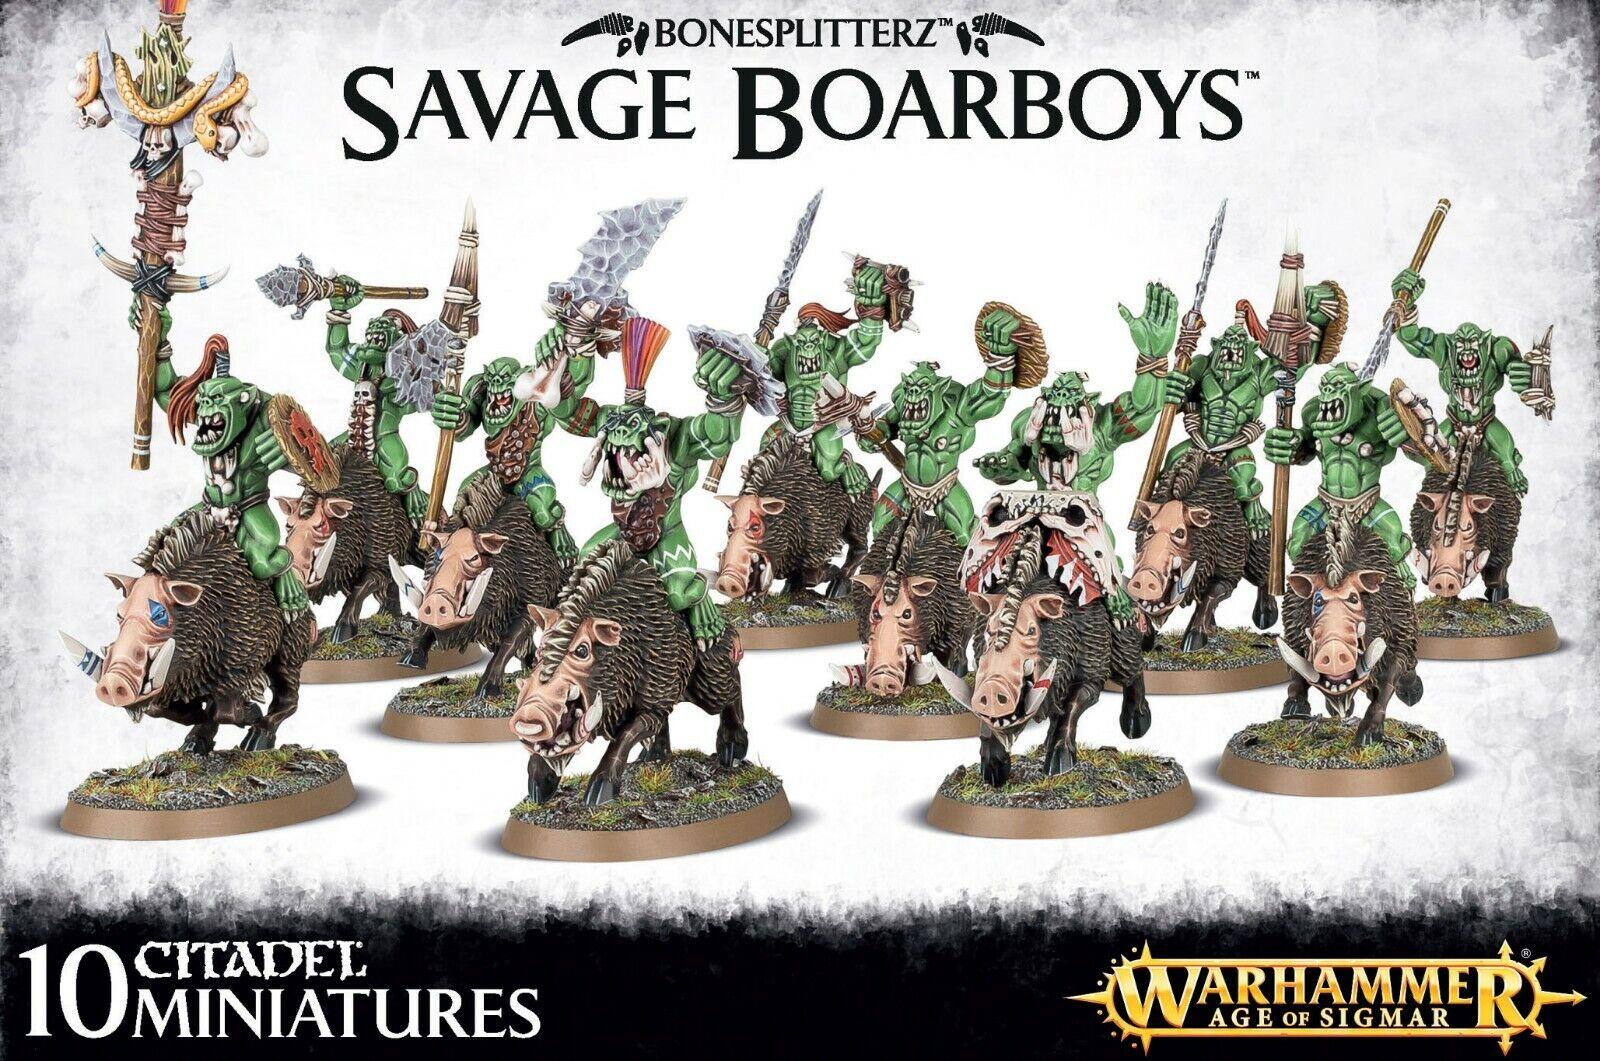 Warhammer Age of Sigmar  Bonesplitterz Savage Boarboys 89-20